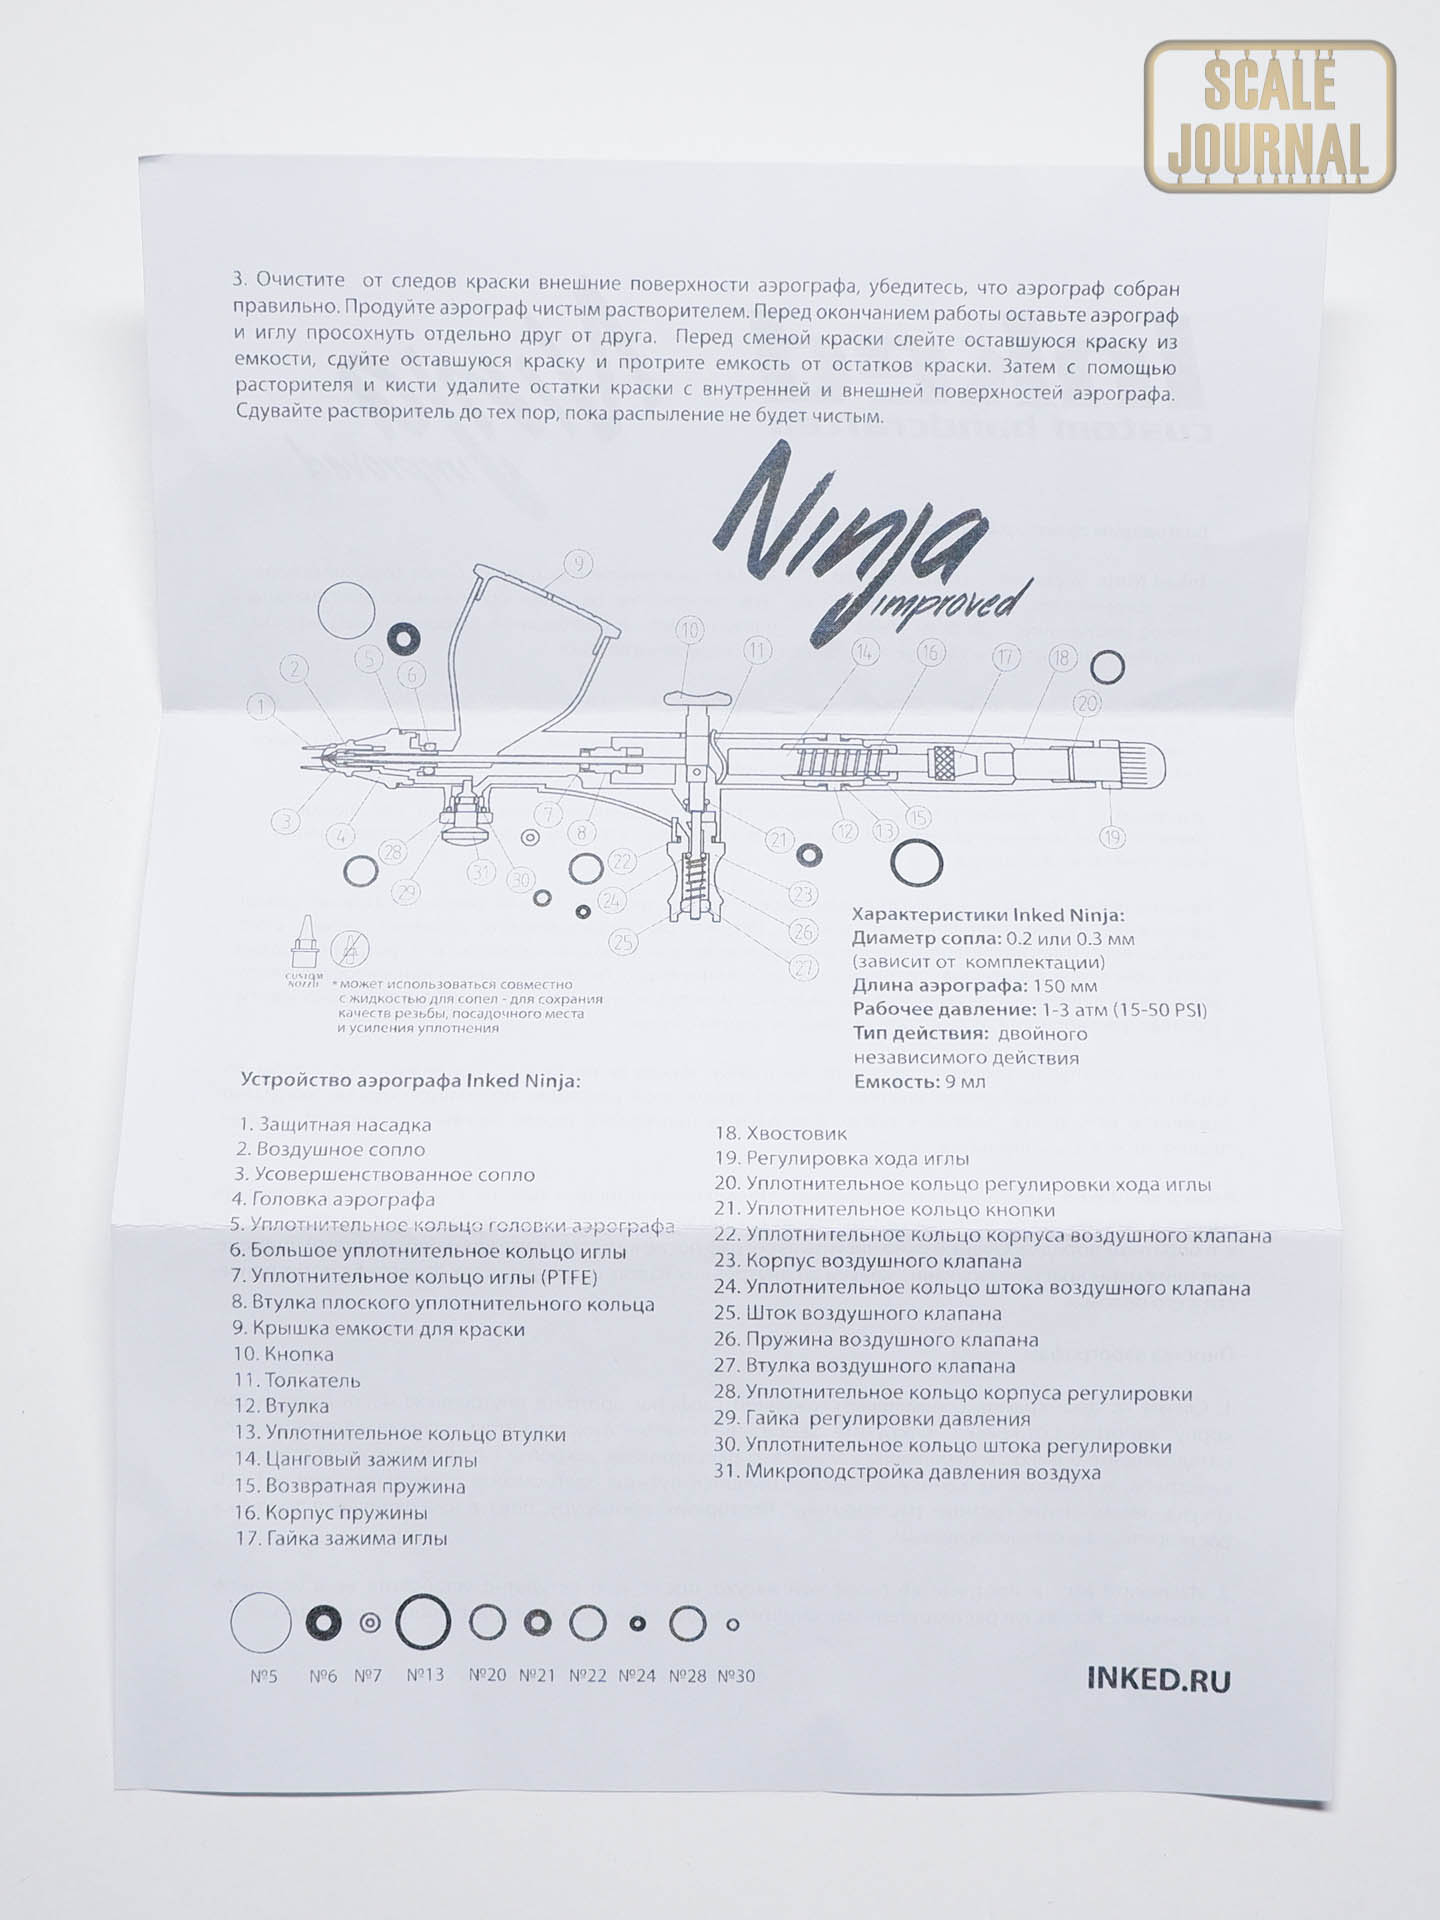 аэрограф Inked Ninja